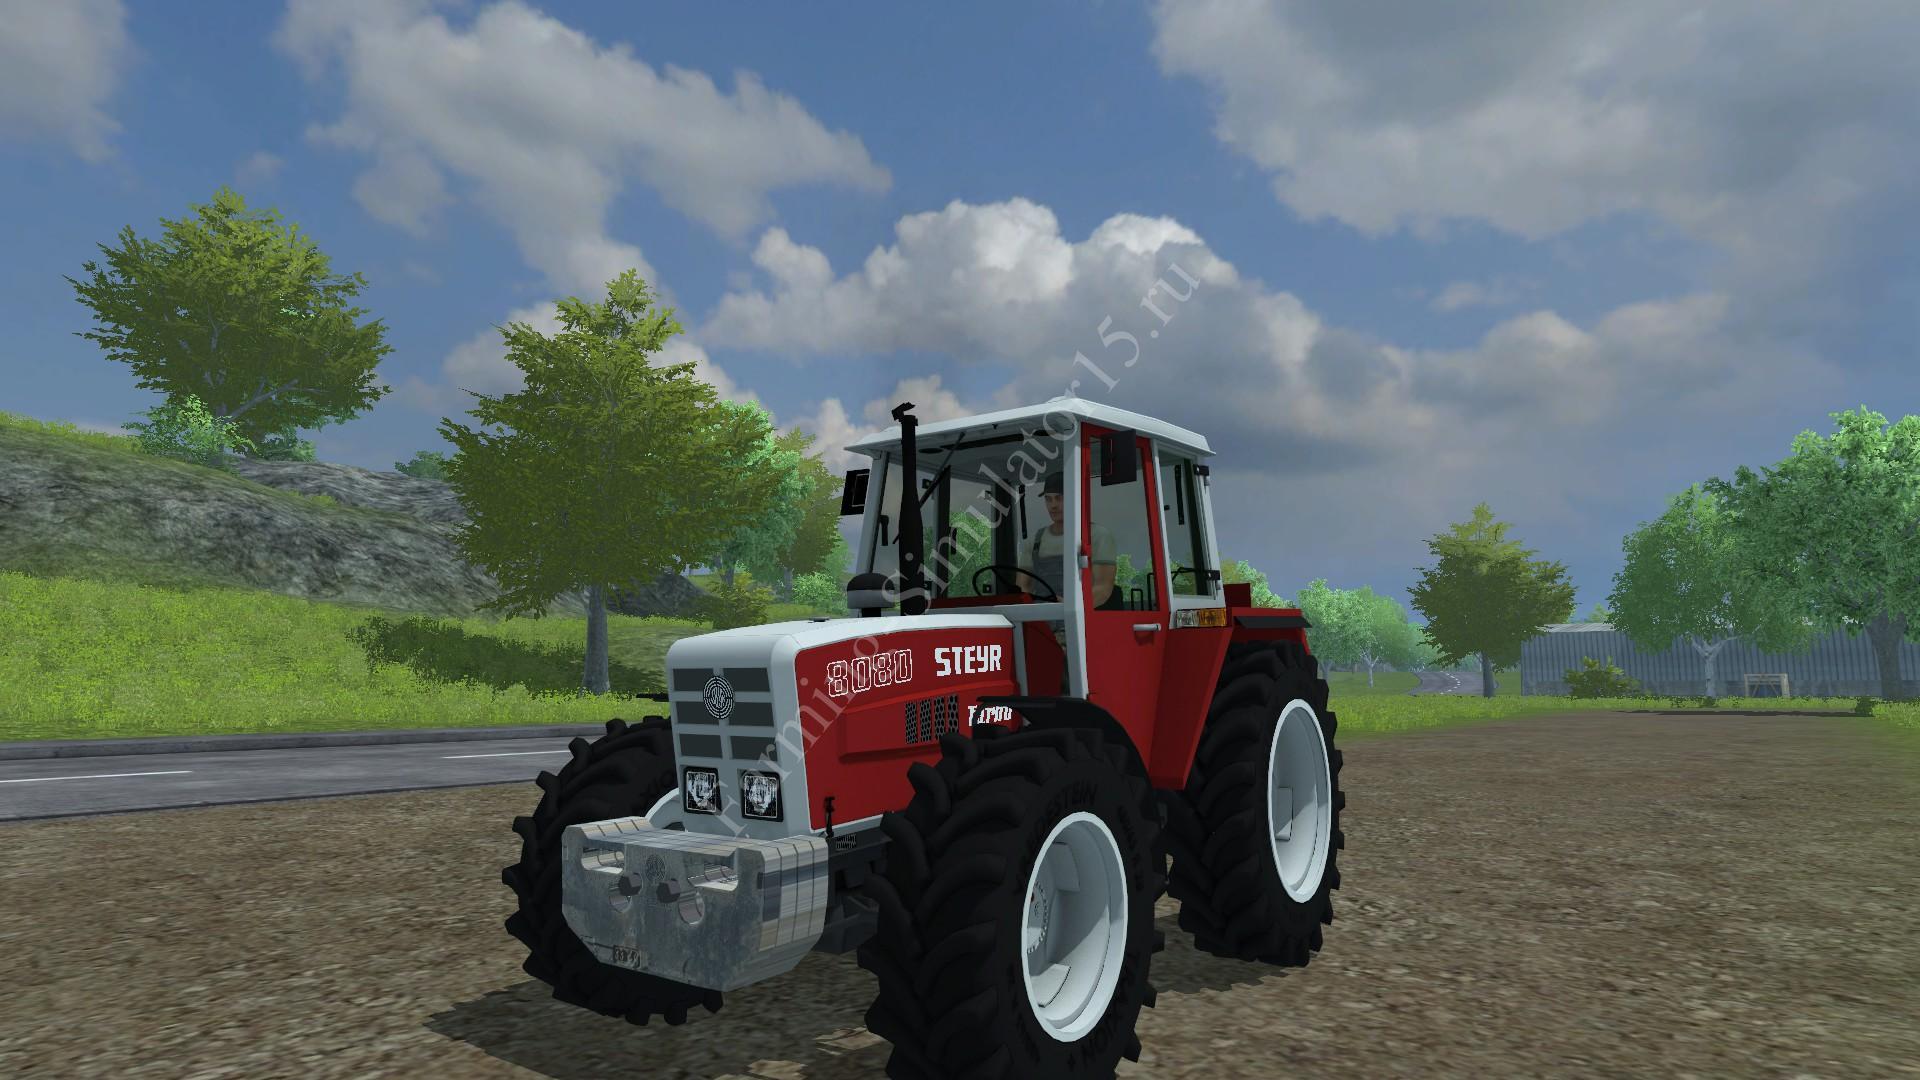 Мод противовеса Steyr weight v 1.0 Farming Simulator 2013, Farming Simulator 13